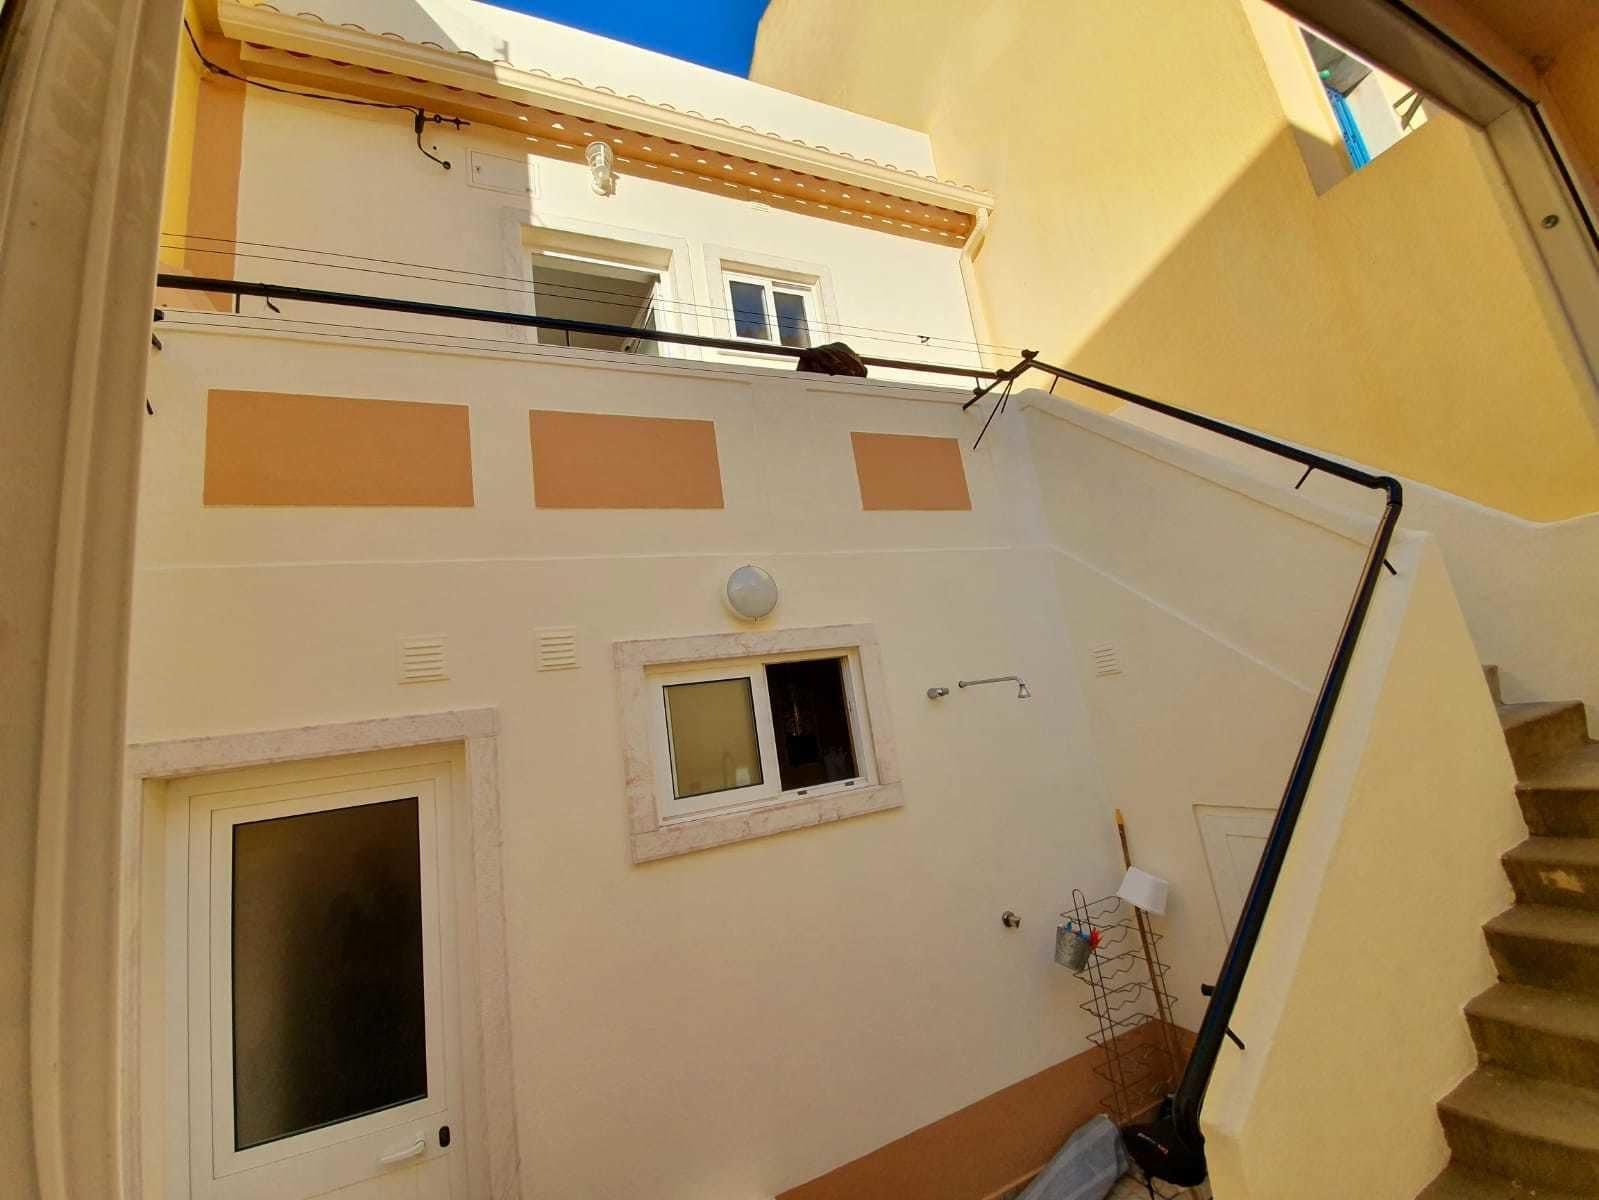 Caparica Surf Apartment by Host-Point, Almada